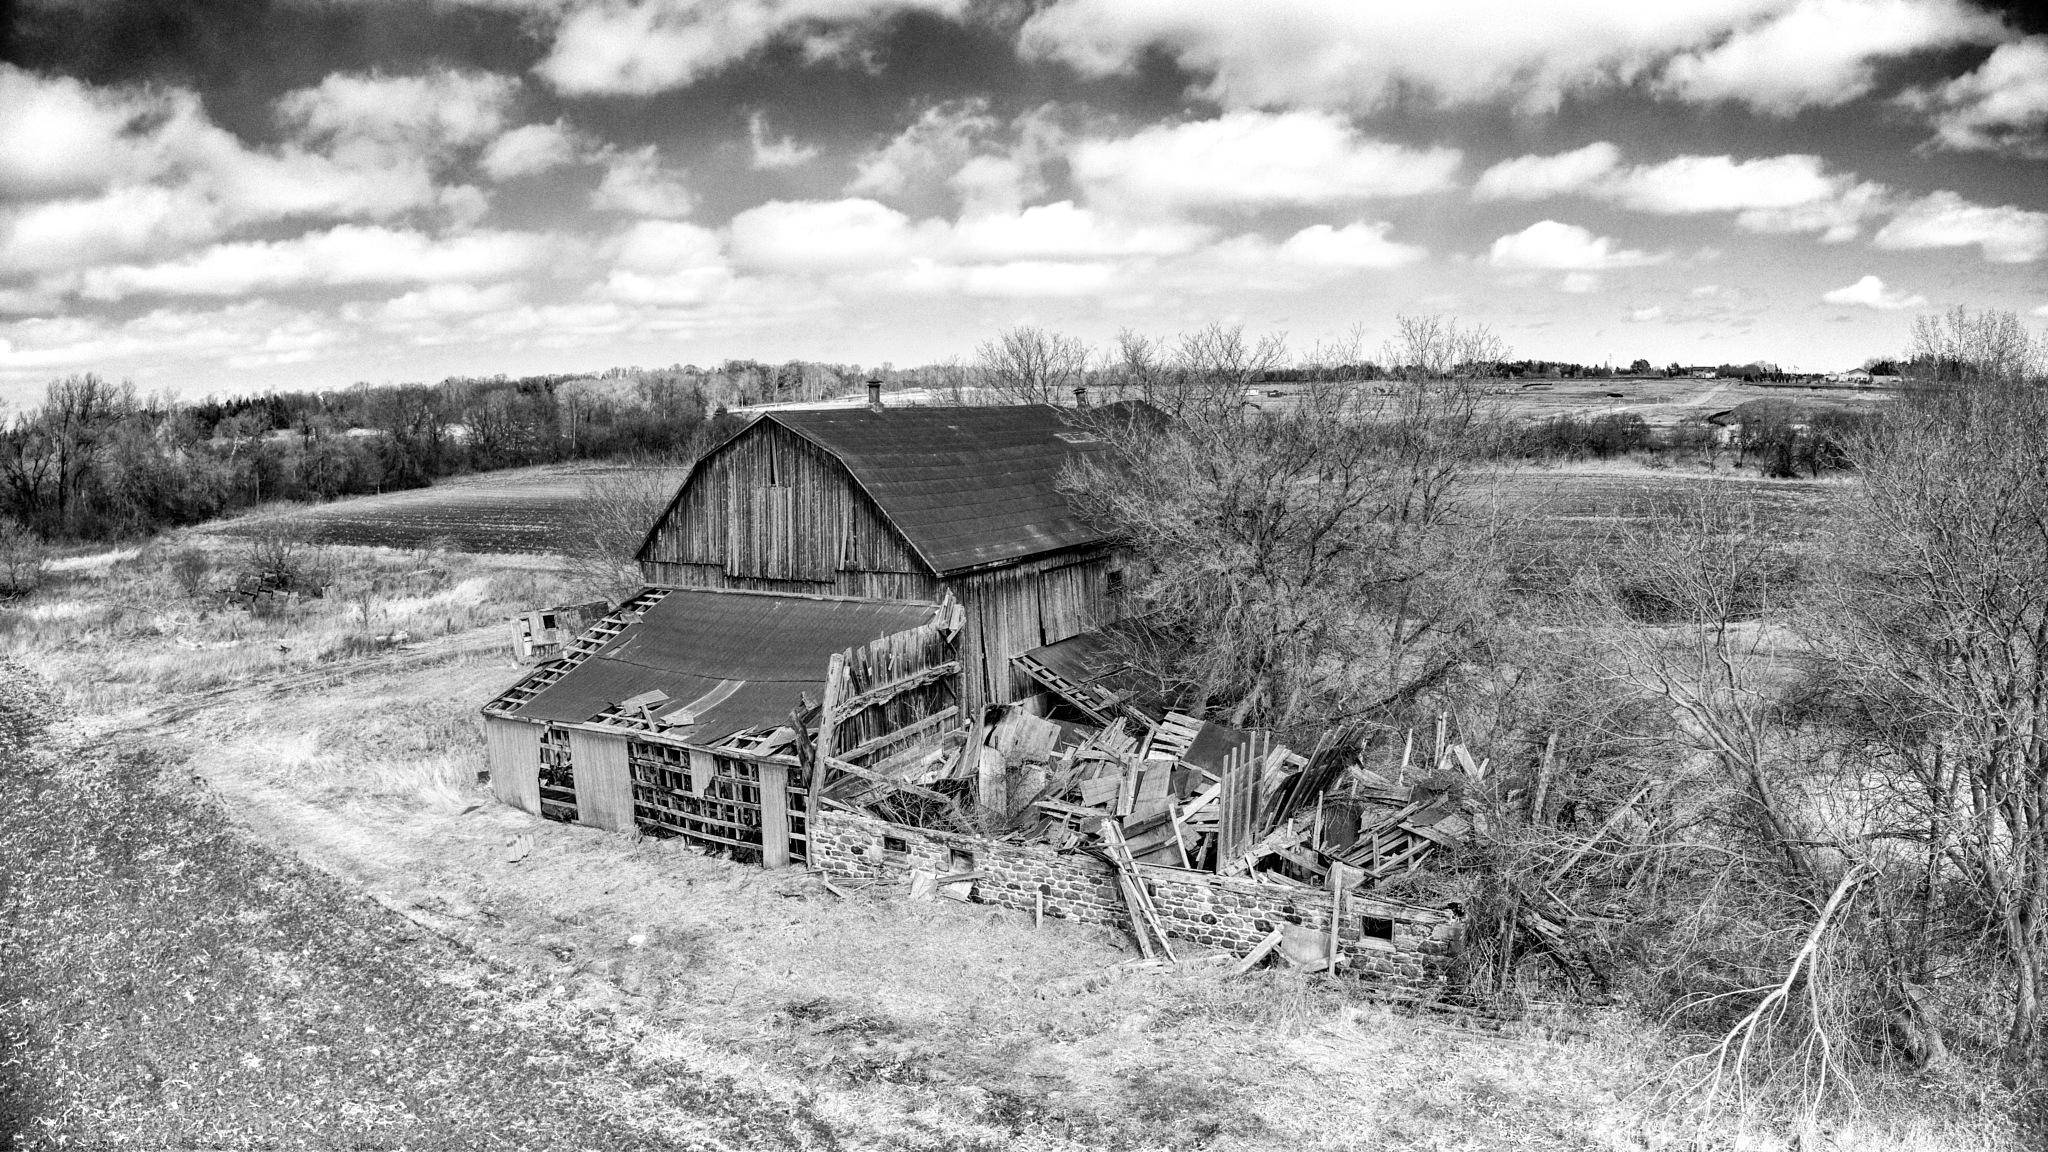 Urban Rural by Herb Drummond